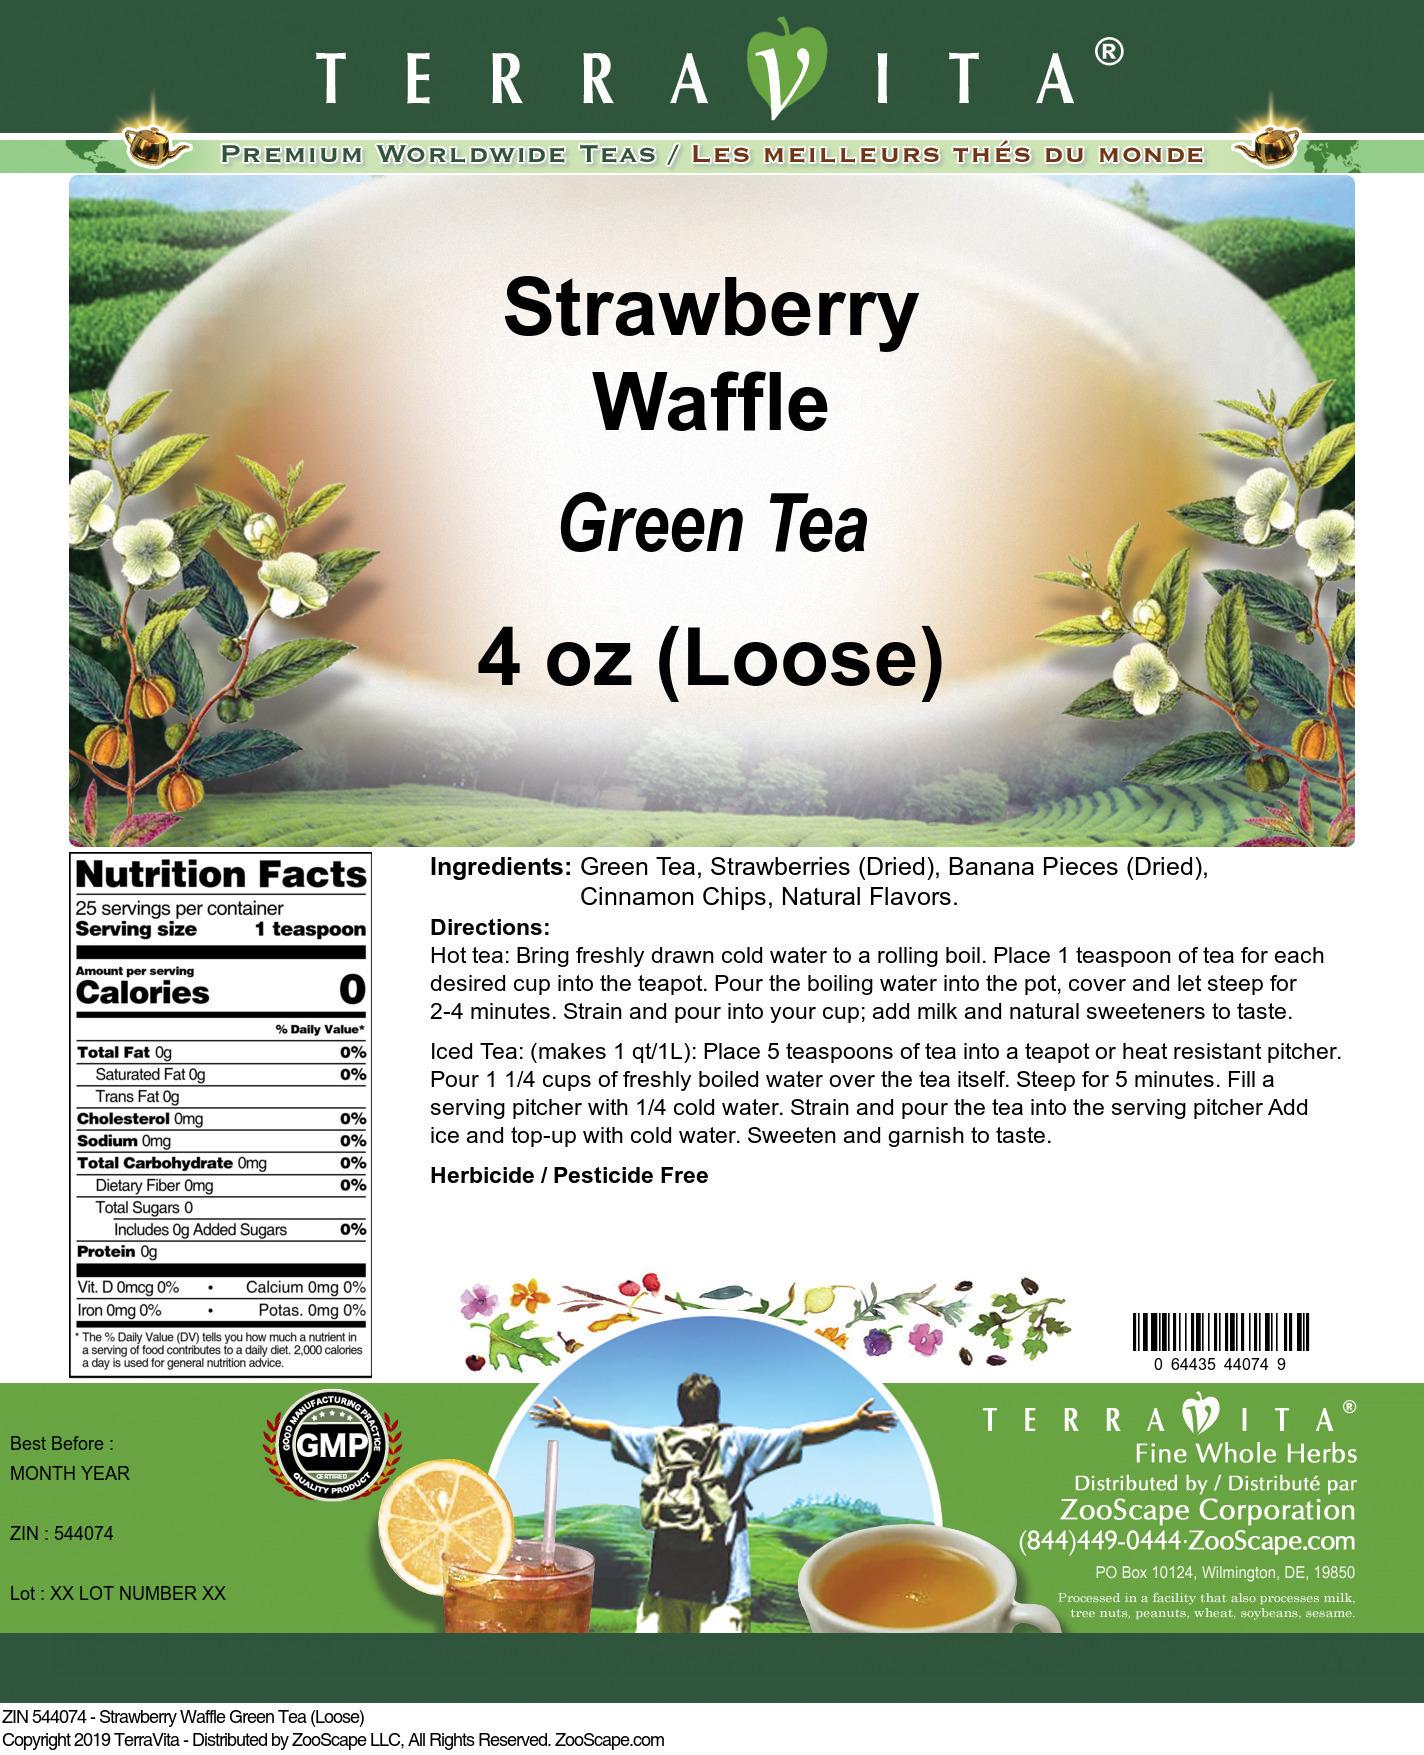 Strawberry Waffle Green Tea (Loose)